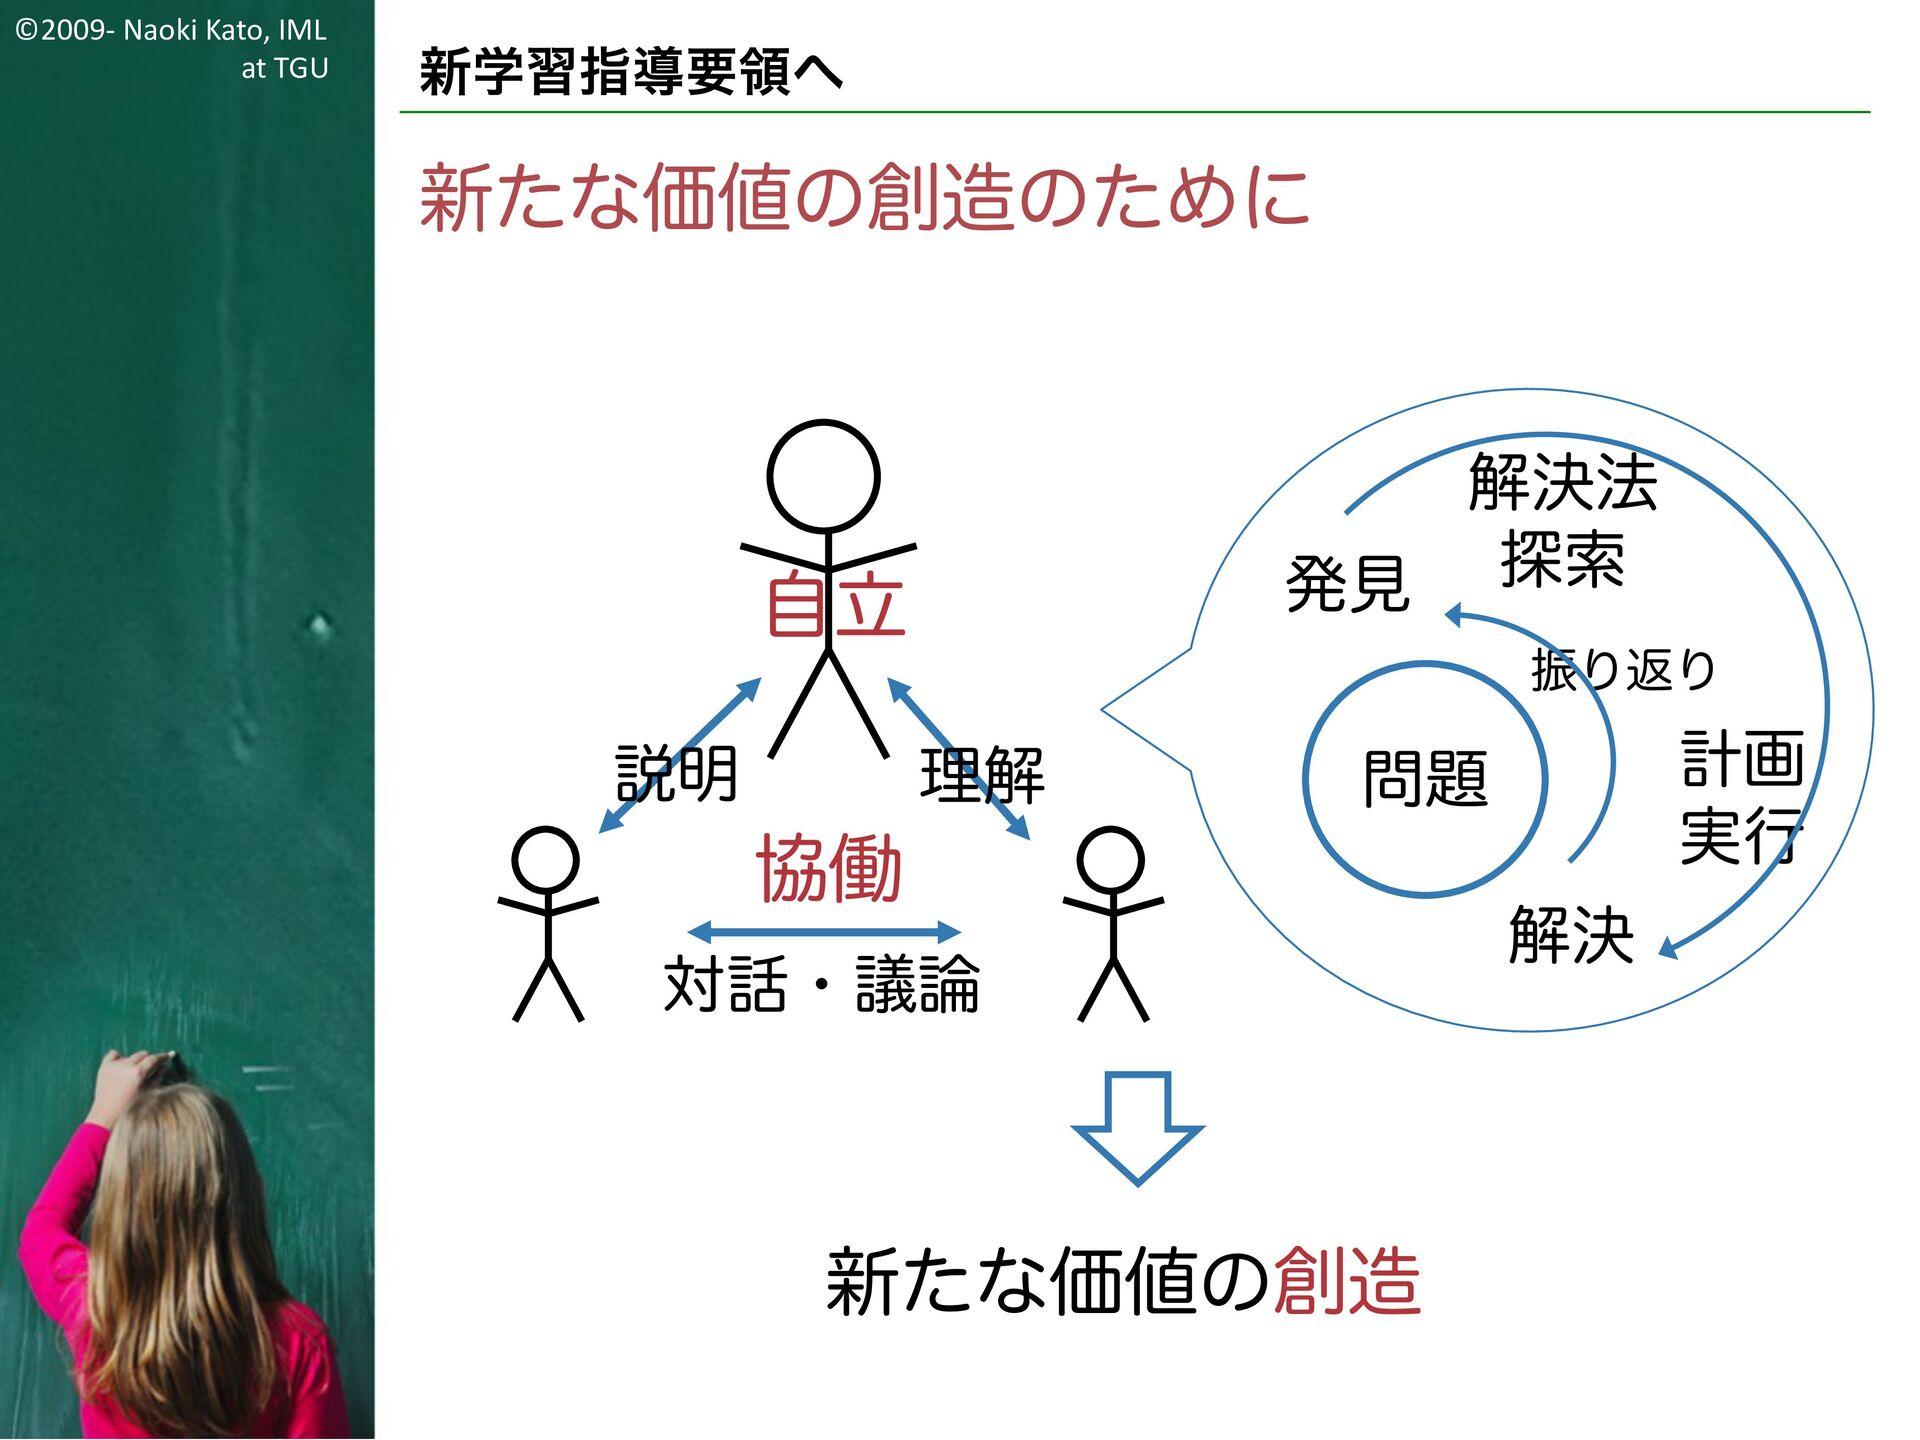 ©2009- Naoki Kato, IML at TGU 新学習指導要領へ こんな世の中に?...